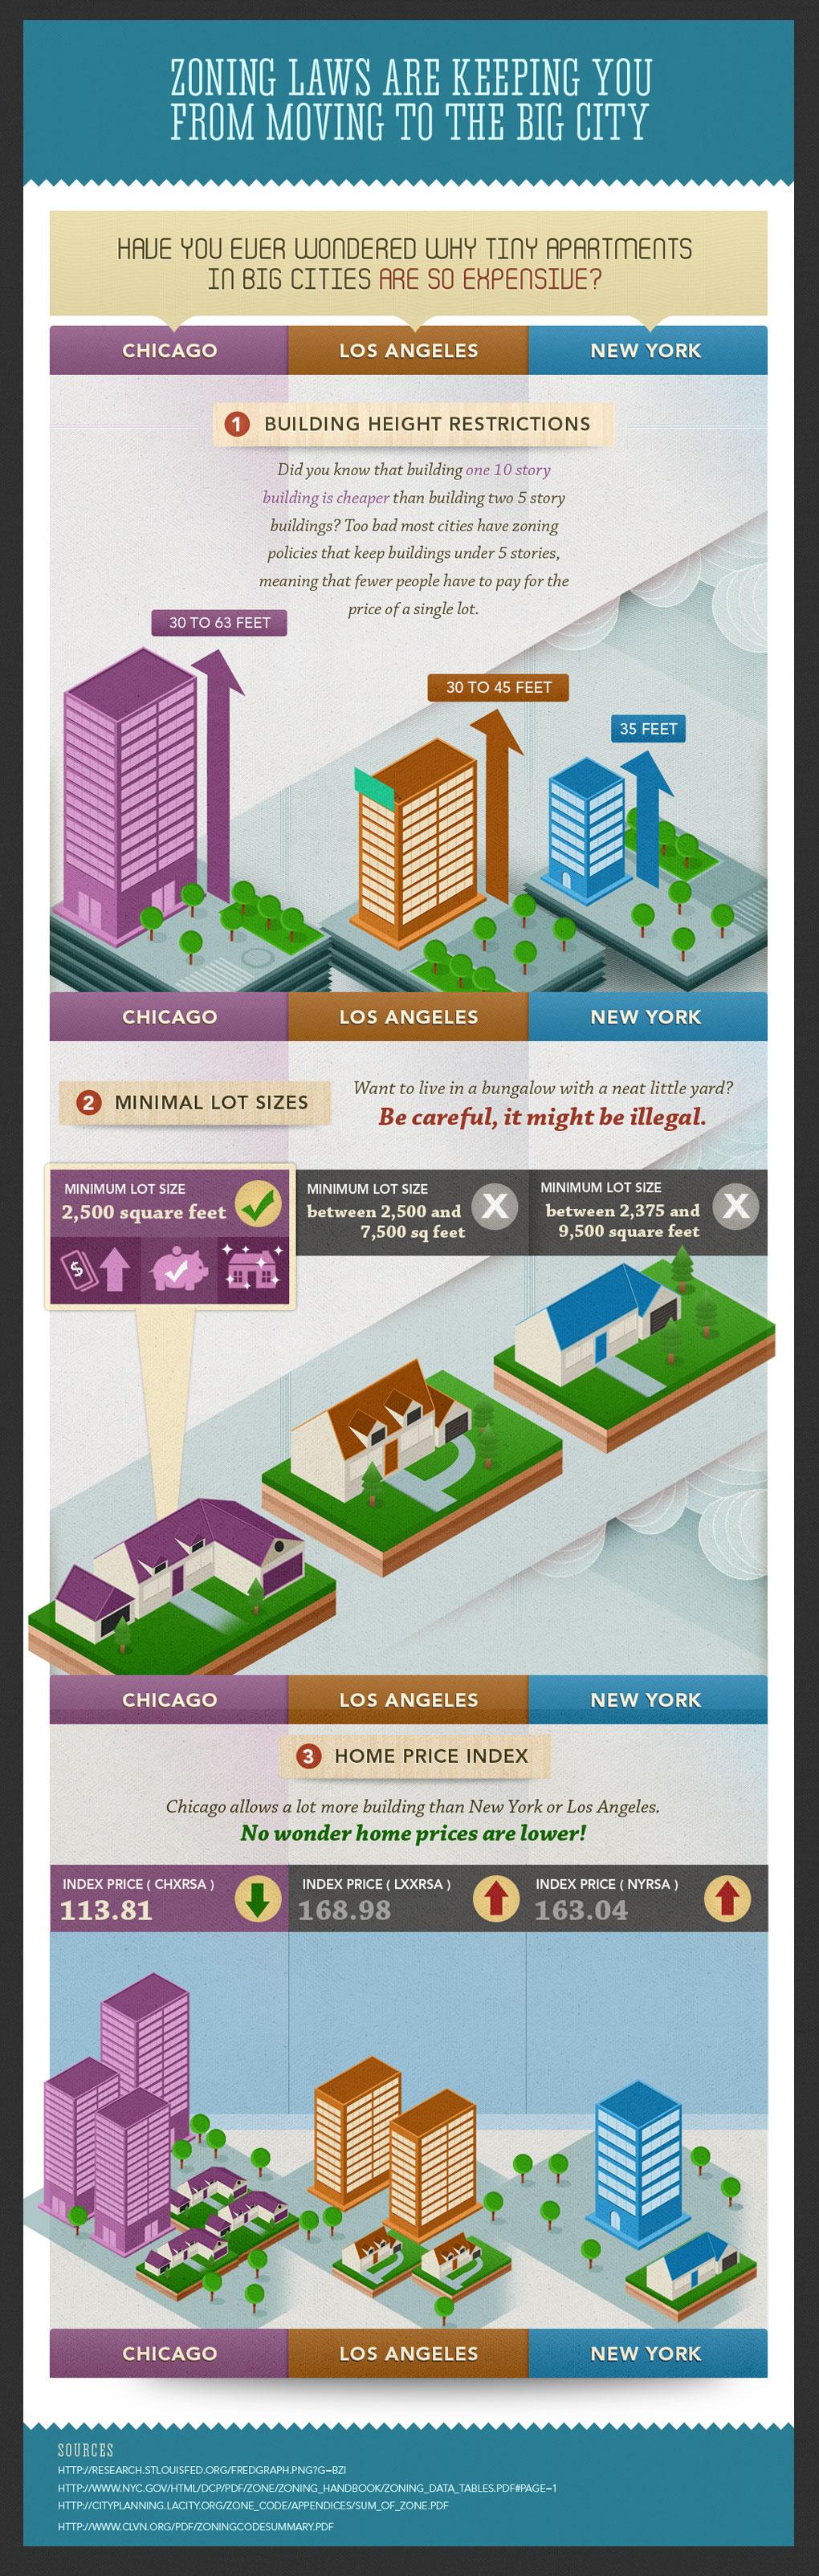 Rent Costs And Zoning Laws Finances Online Urban Design Plan Urban Design Diagram Urban Ideas